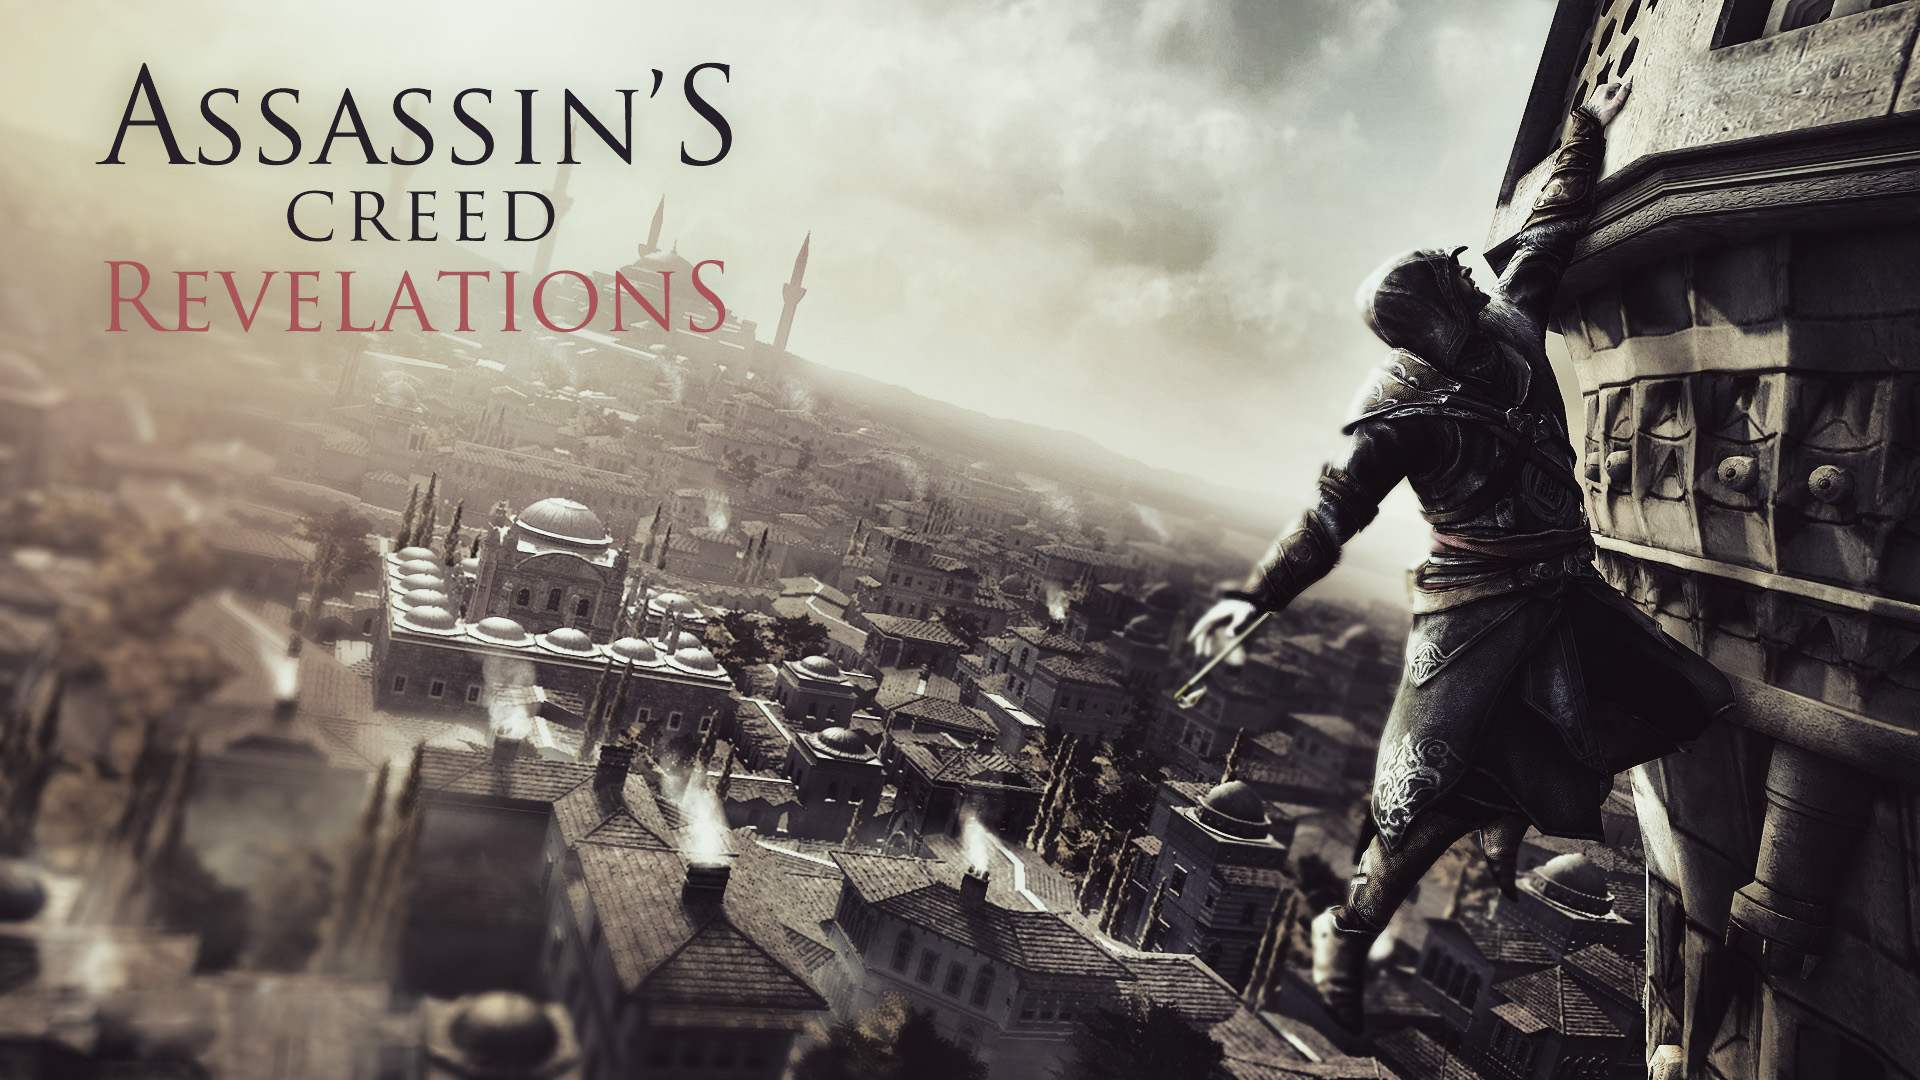 Assassins Creed Revelations Wallpaper Full HD 1080p HD Desktop 1920x1080